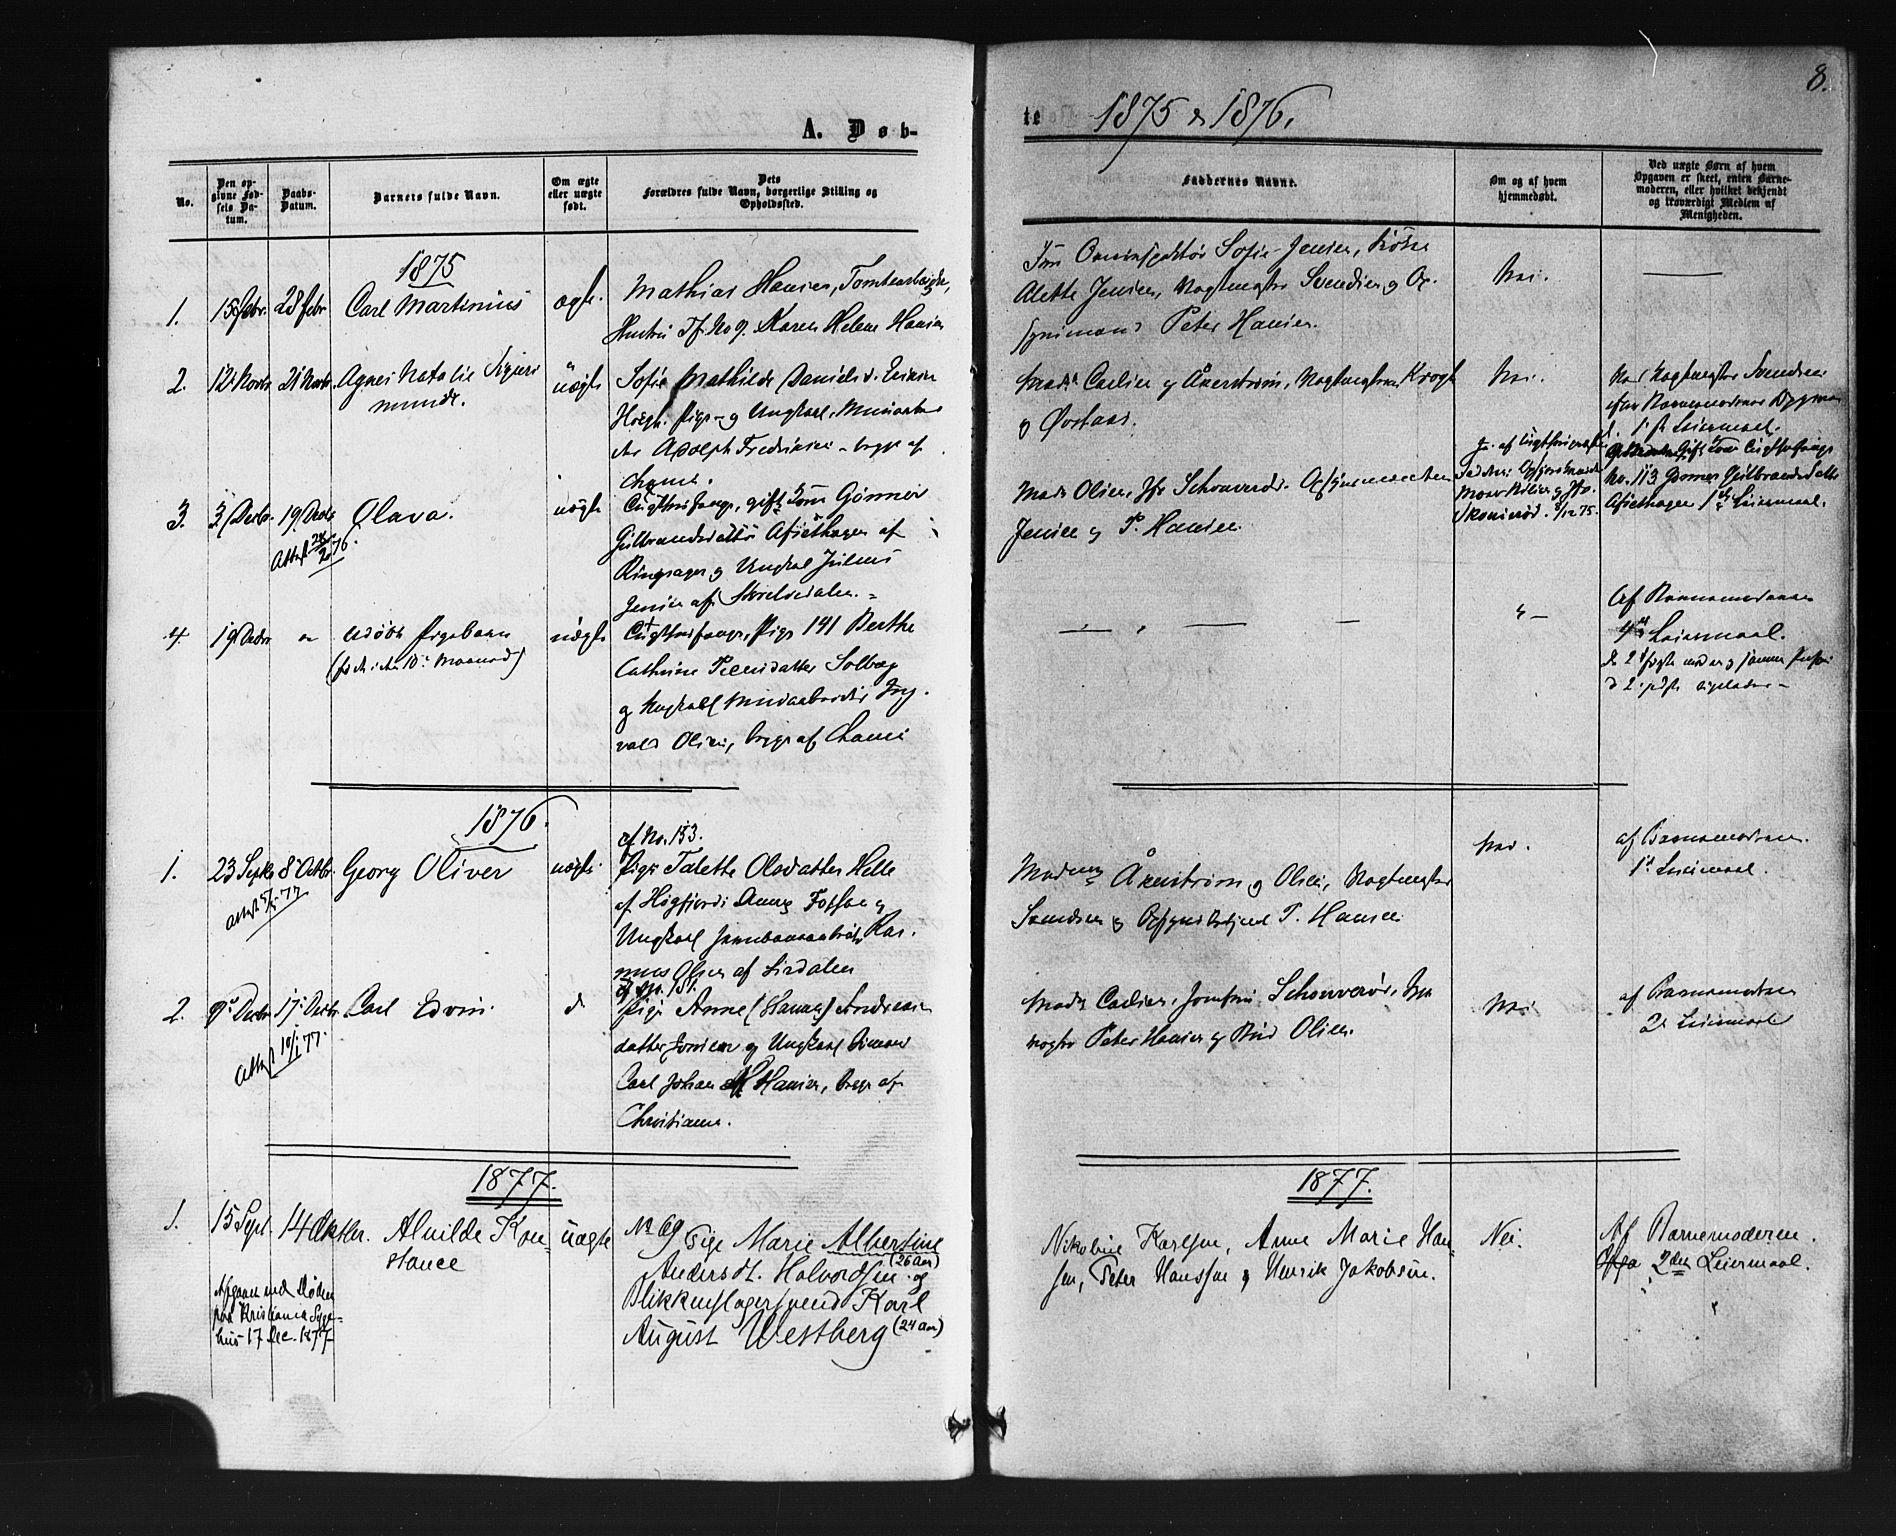 SAO, Kristiania tukthusprest Kirkebøker, F/Fa/L0004: Ministerialbok nr. 4, 1865-1879, s. 8